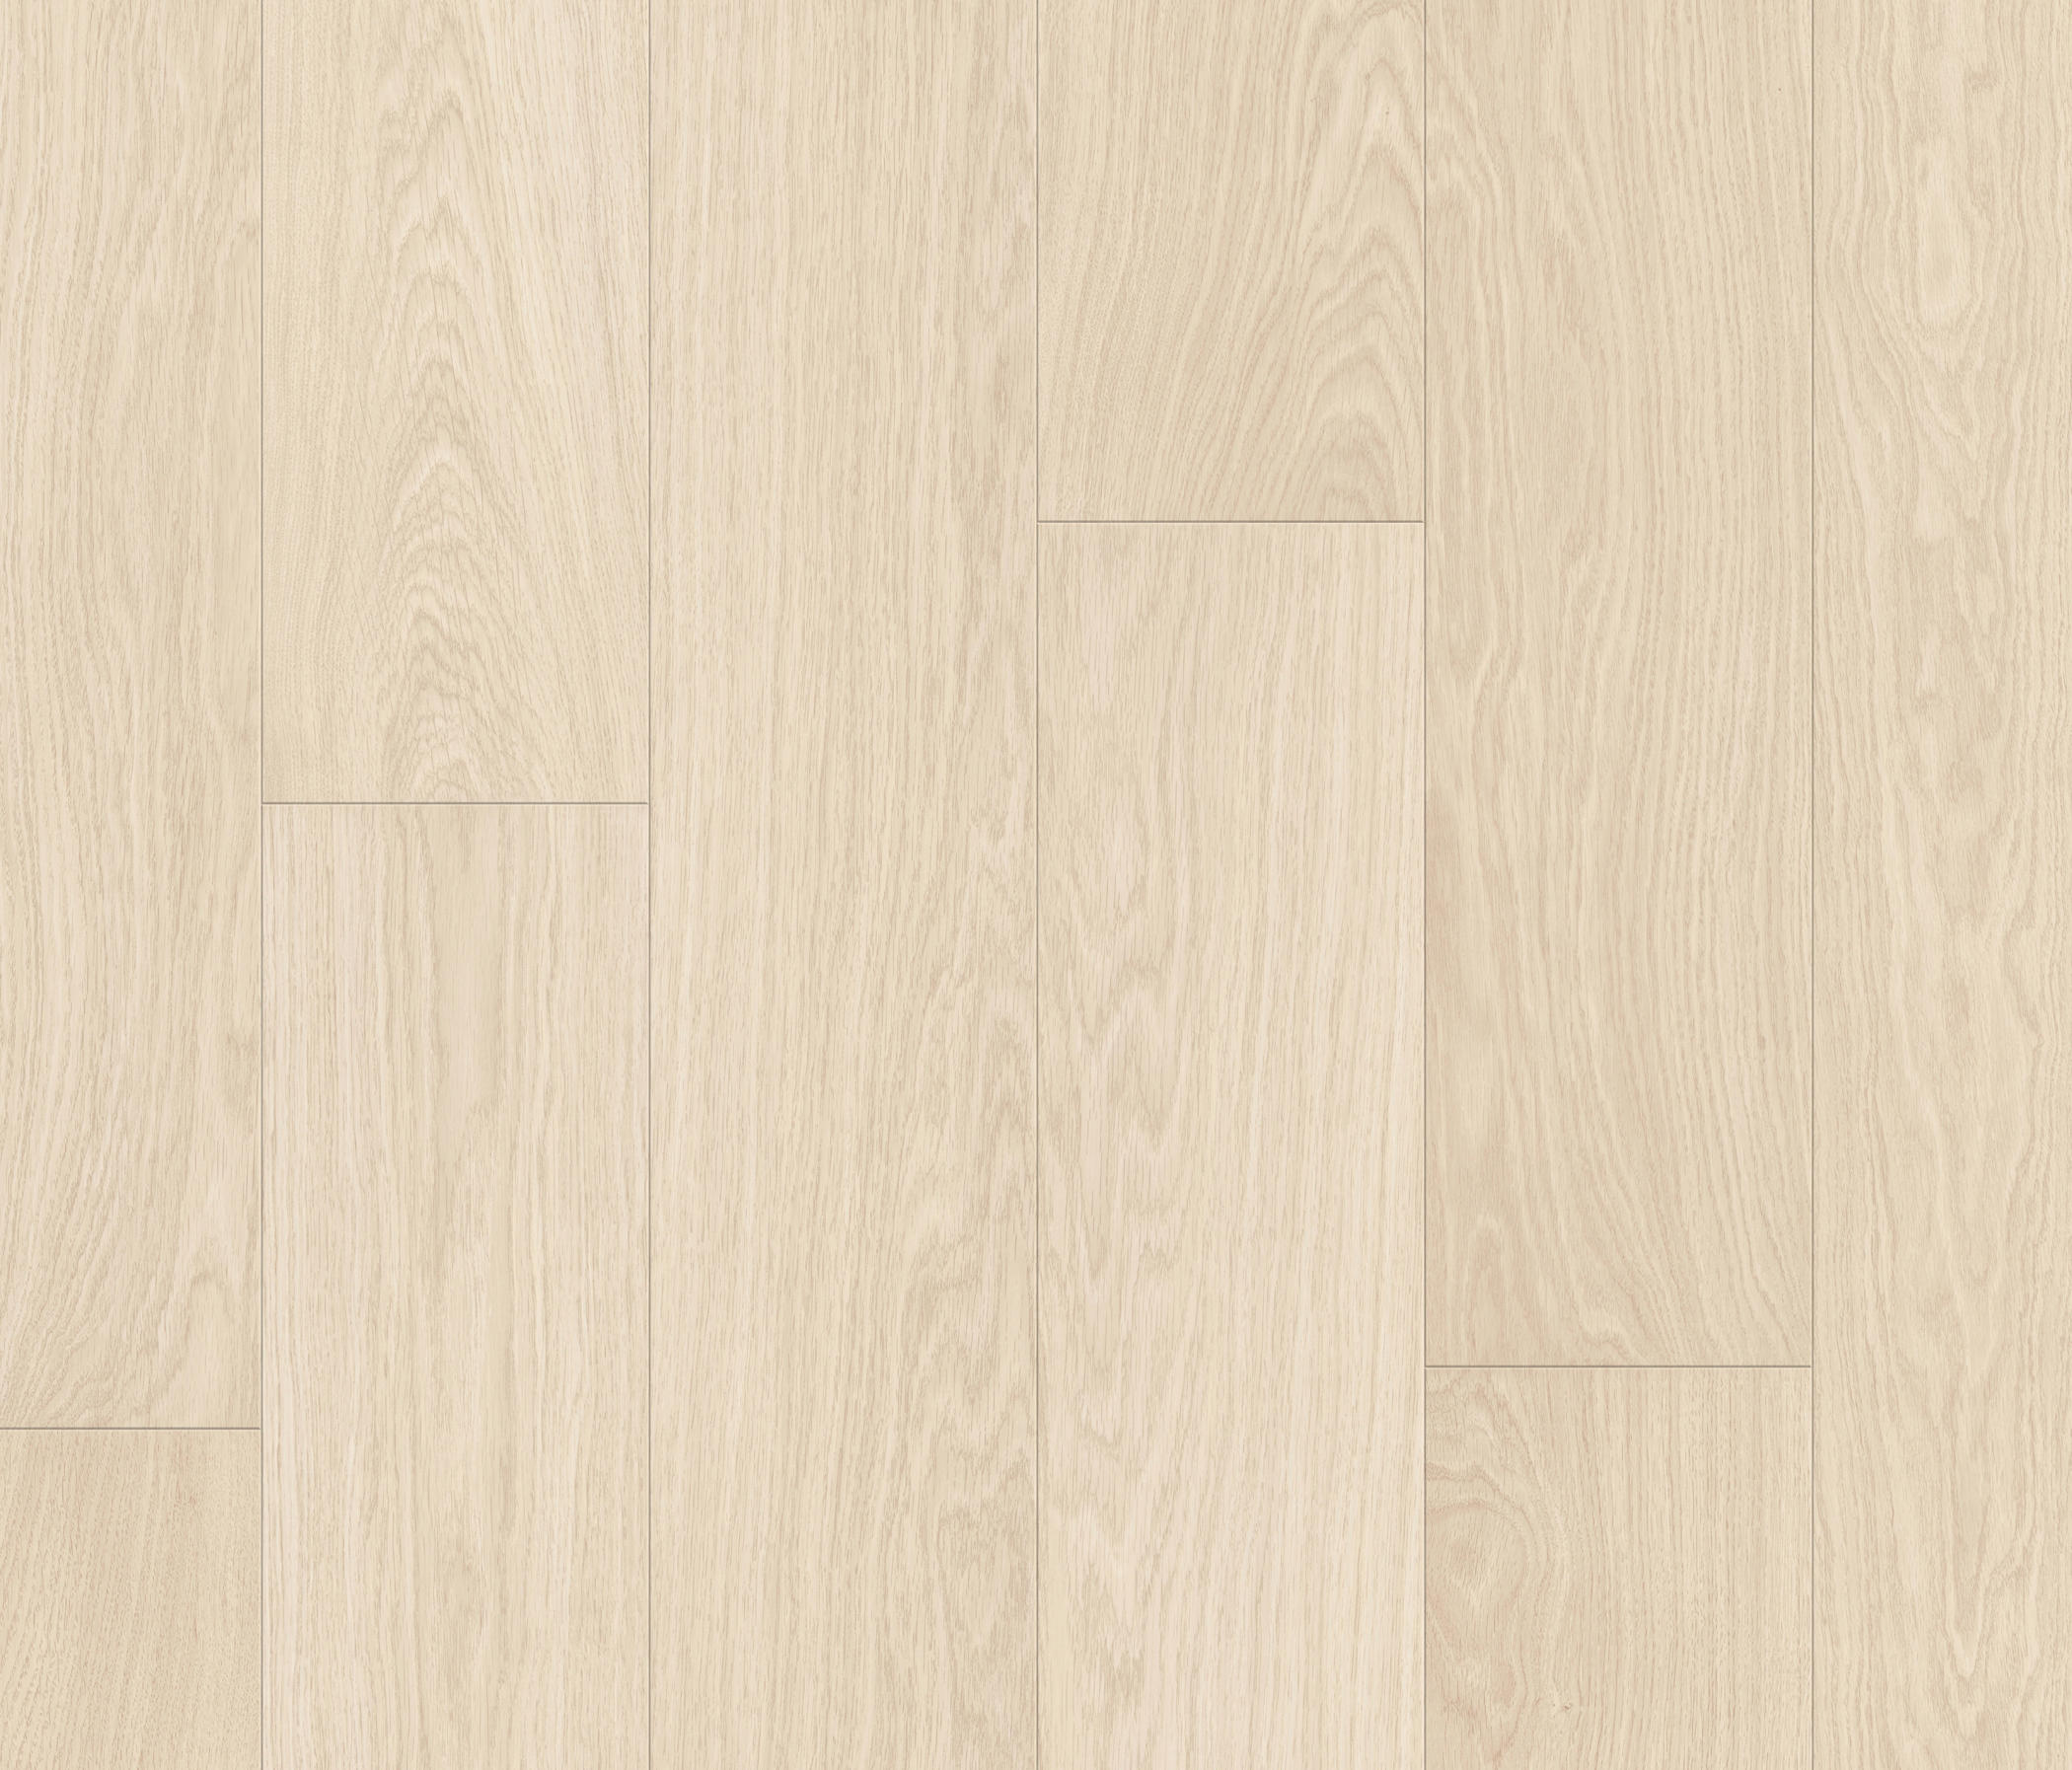 Modern Plank Modern Danish Oak Laminate Flooring From